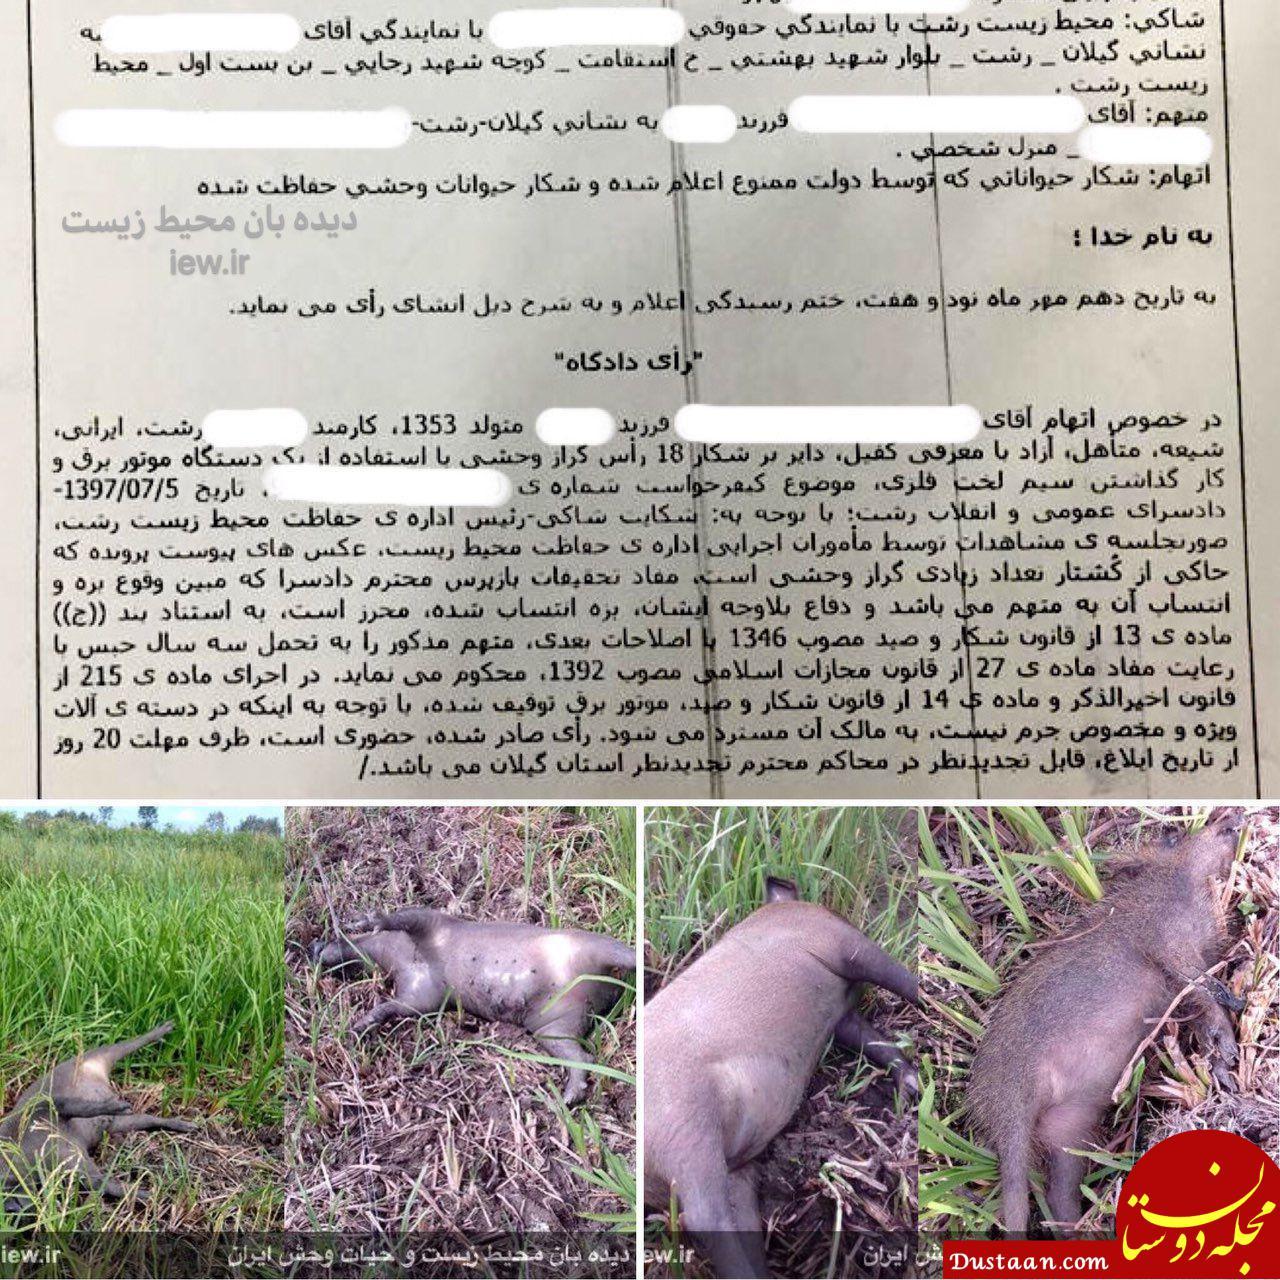 www.dustaan.com 3 سال زندان به دلیل کشتن خوک های وحشی در رشت